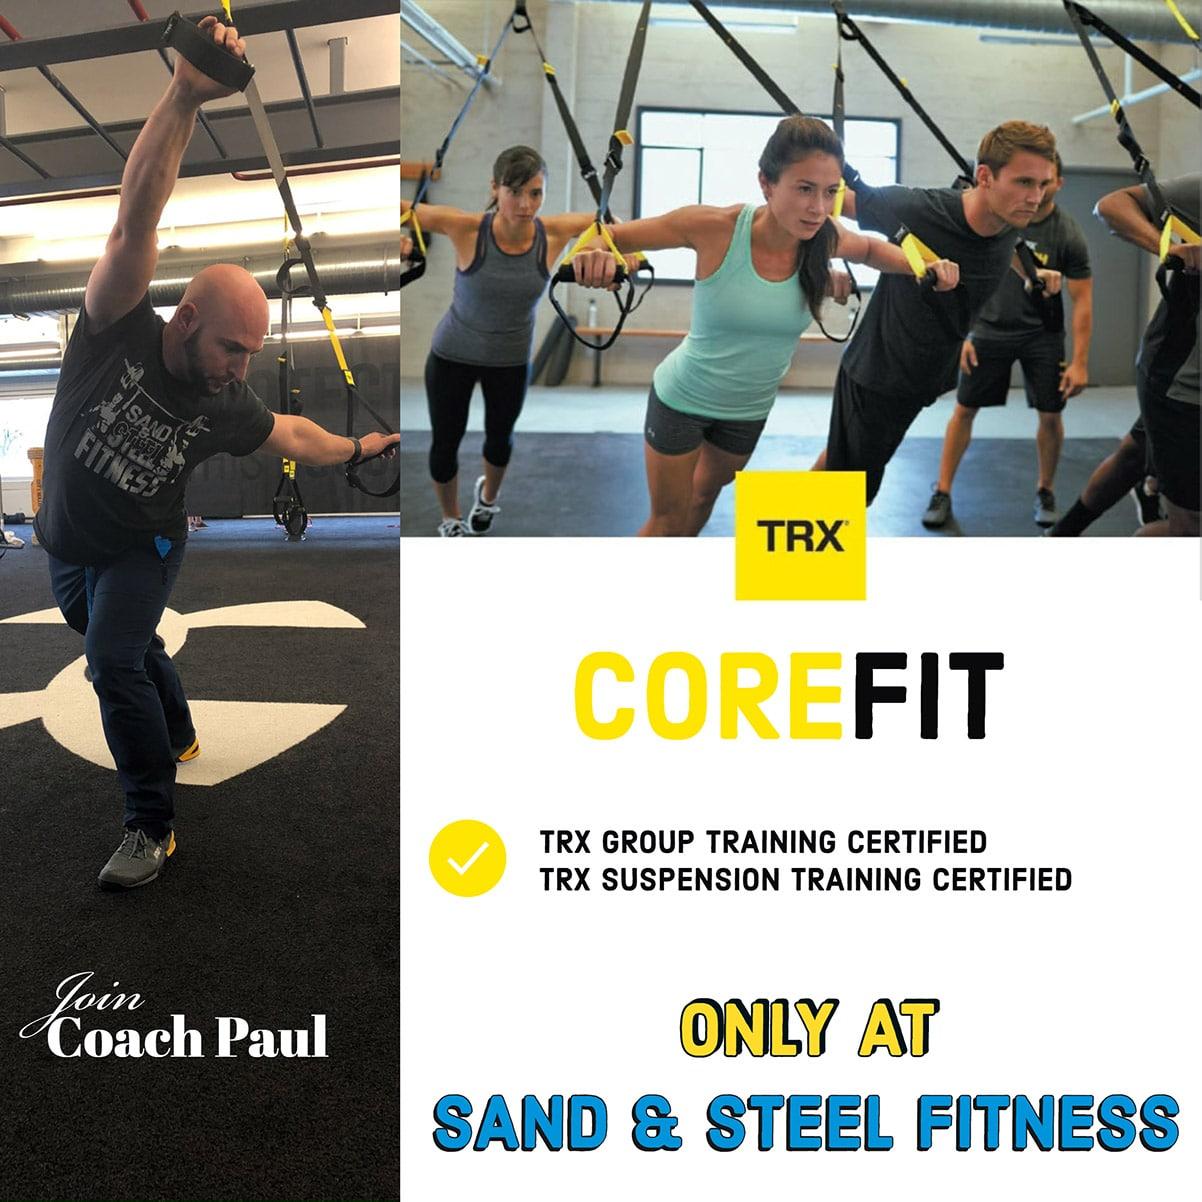 CoreFit TRX Group Certified